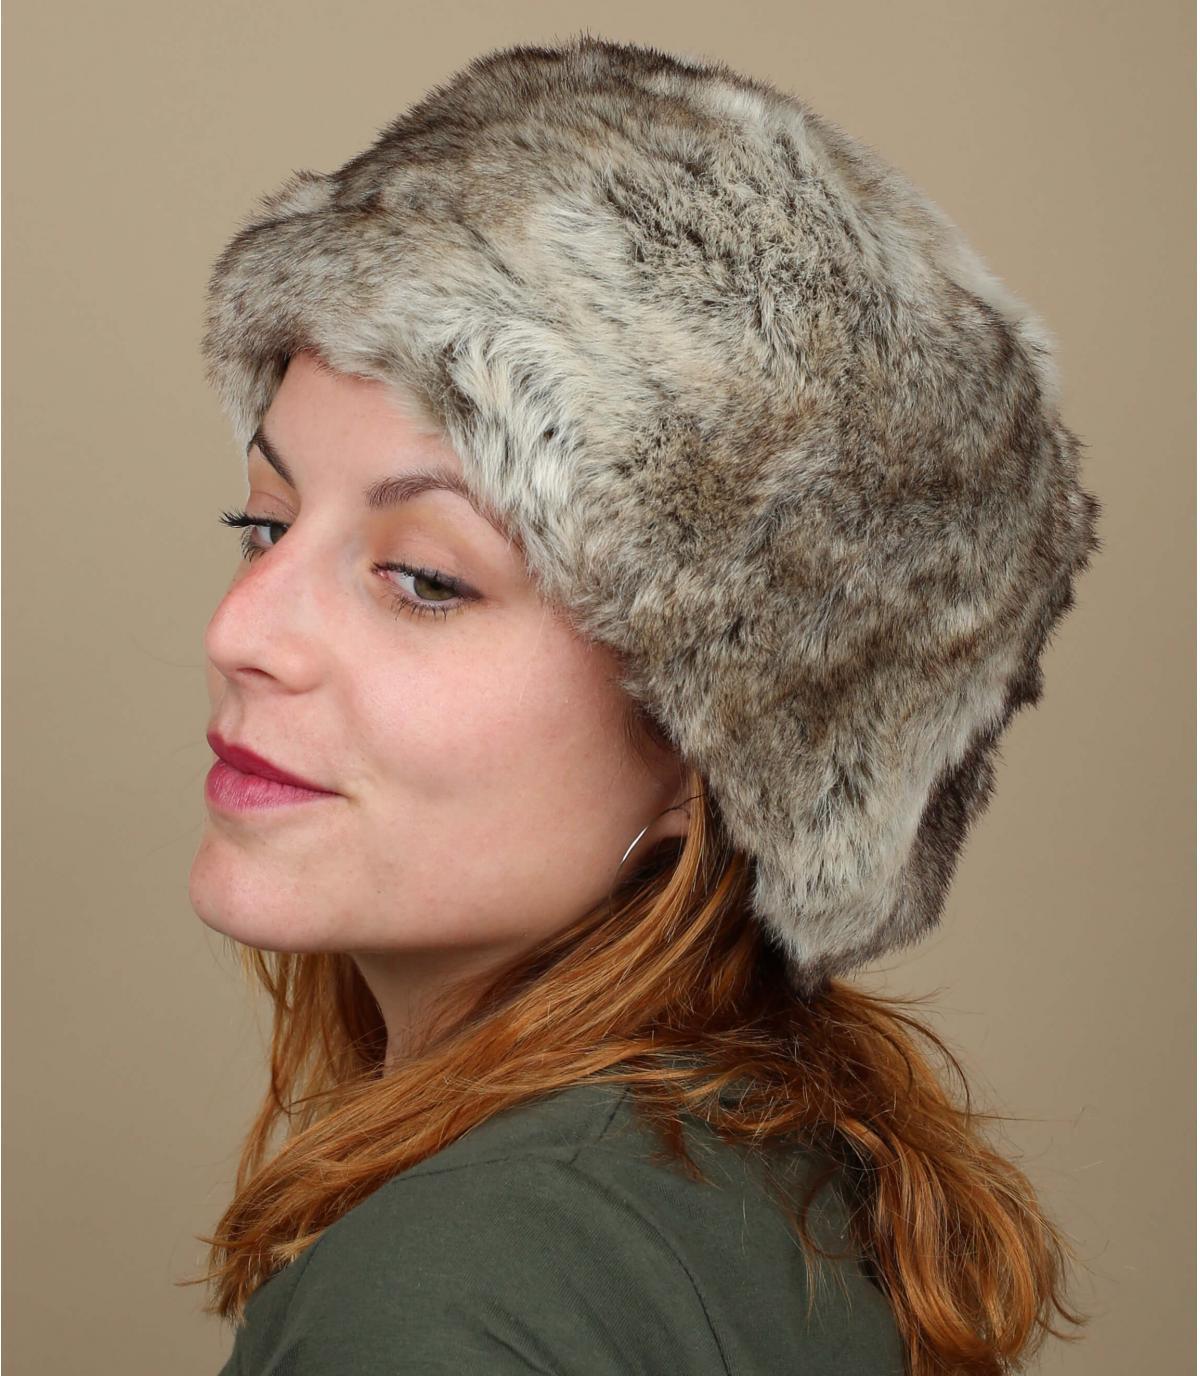 Grijze hoed